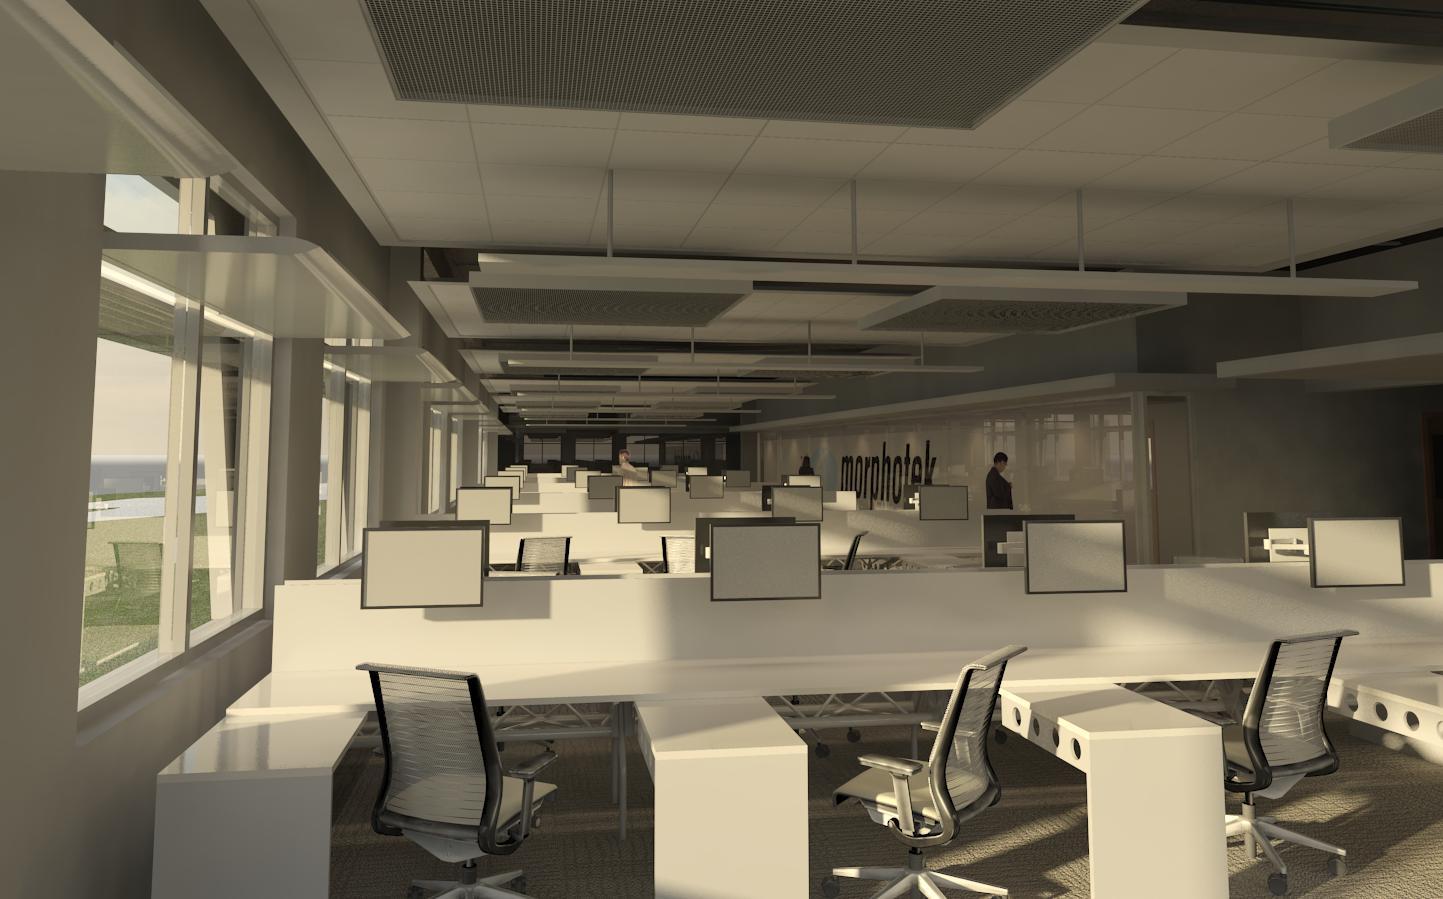 Mtek 3D Office-South-Winter-Best 11-09-2009.jpg